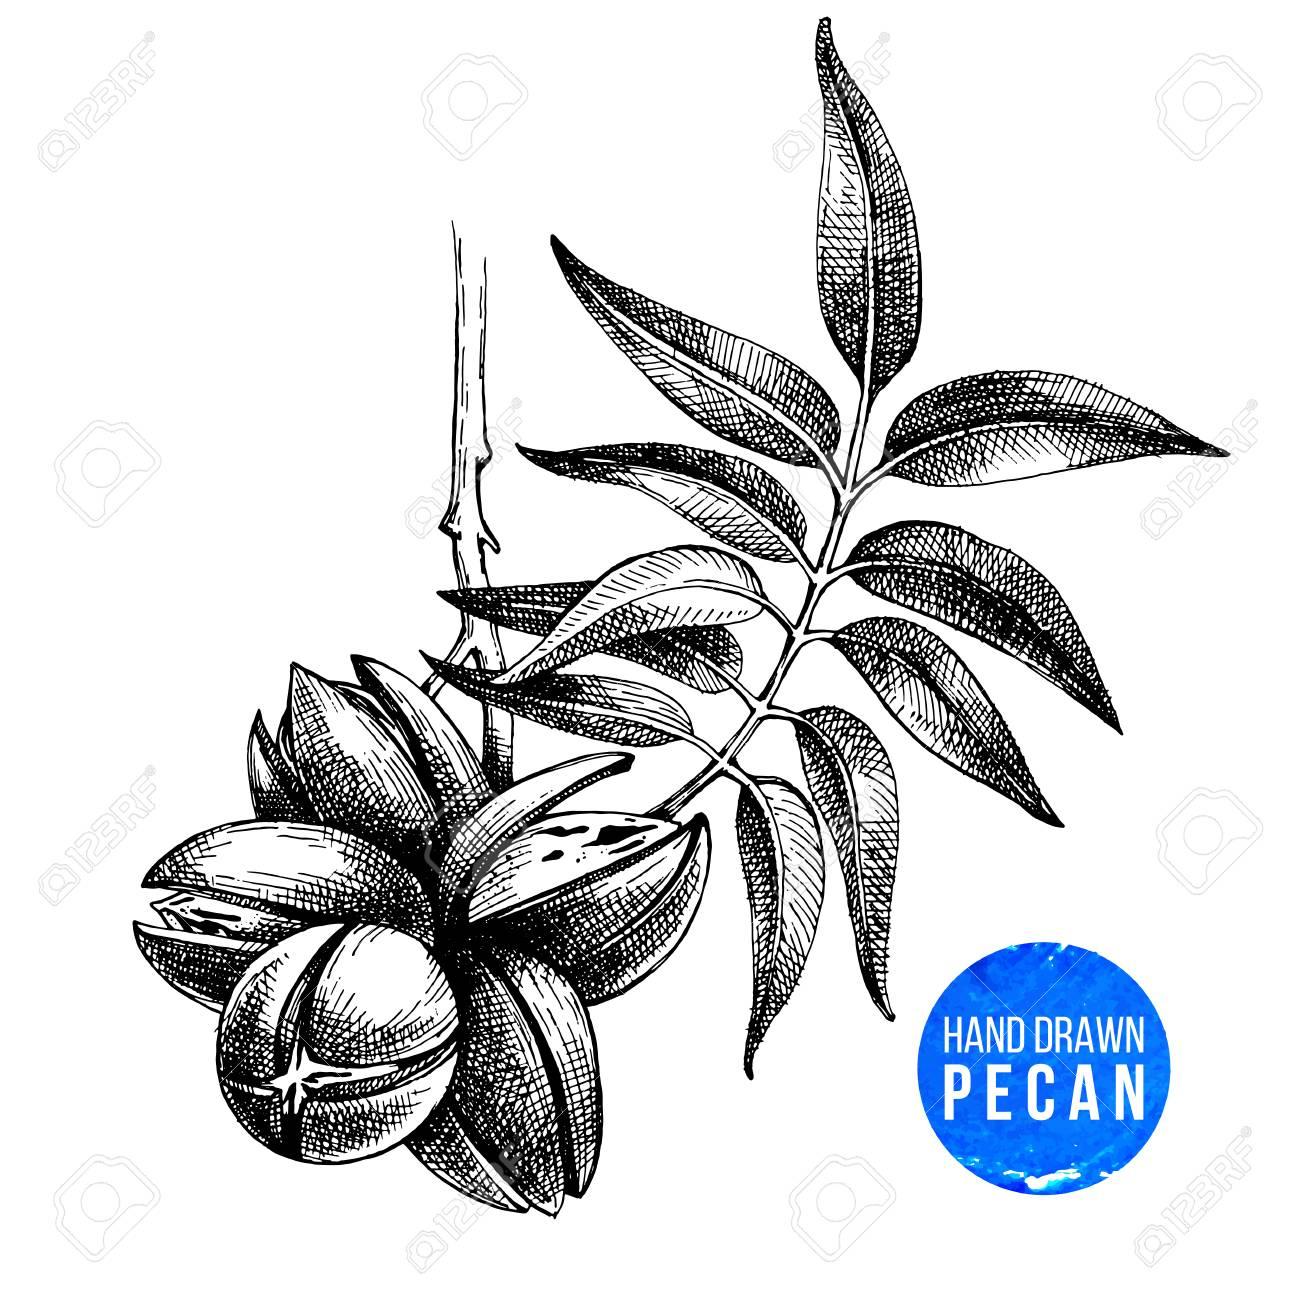 Hand drawn pecan nuts - 86999587